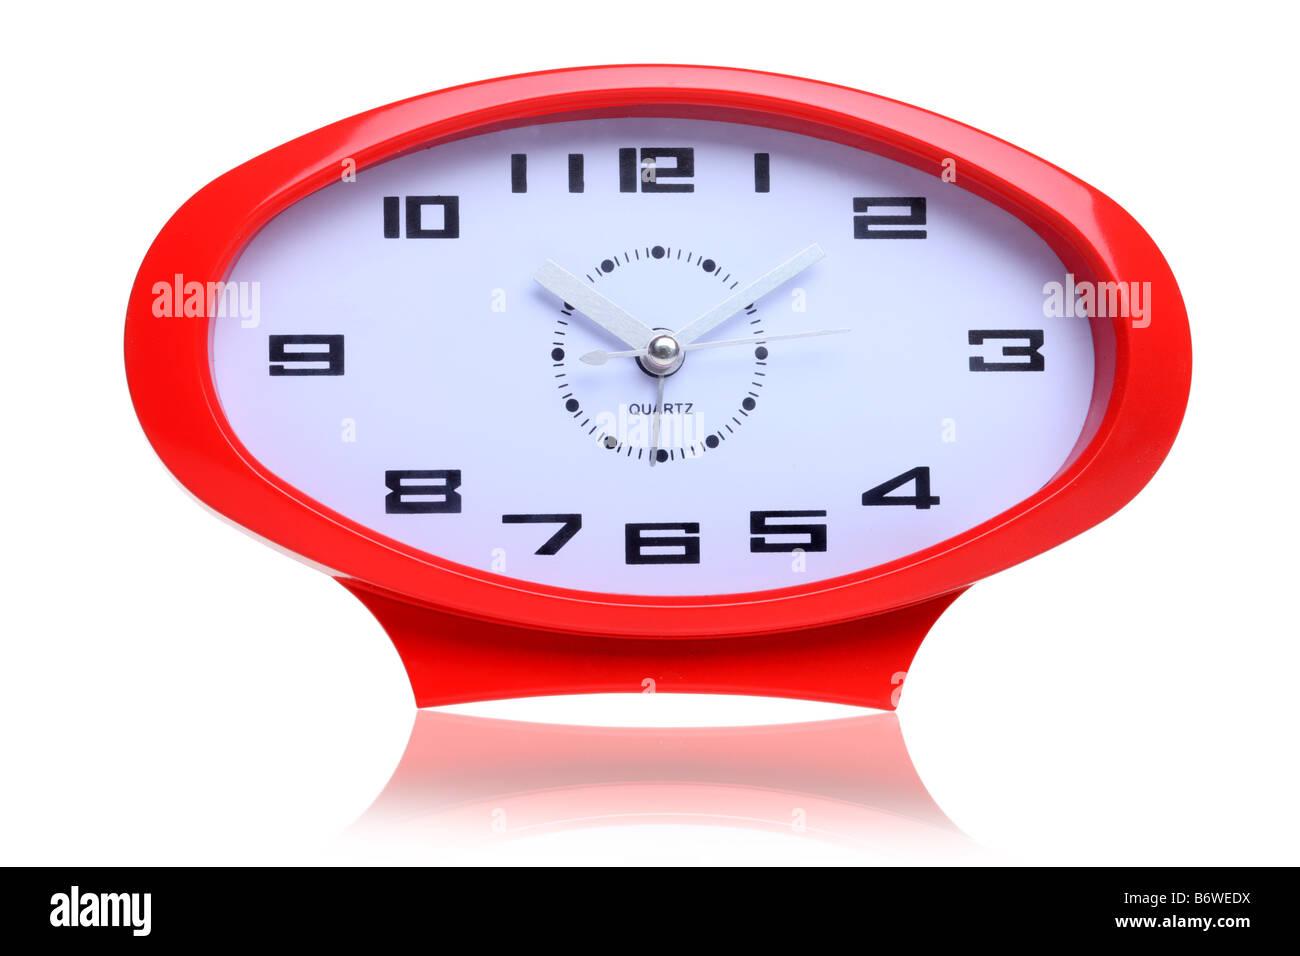 Reloj con forma de óvalo rojo retro recorte aislado sobre fondo blanco. Imagen De Stock